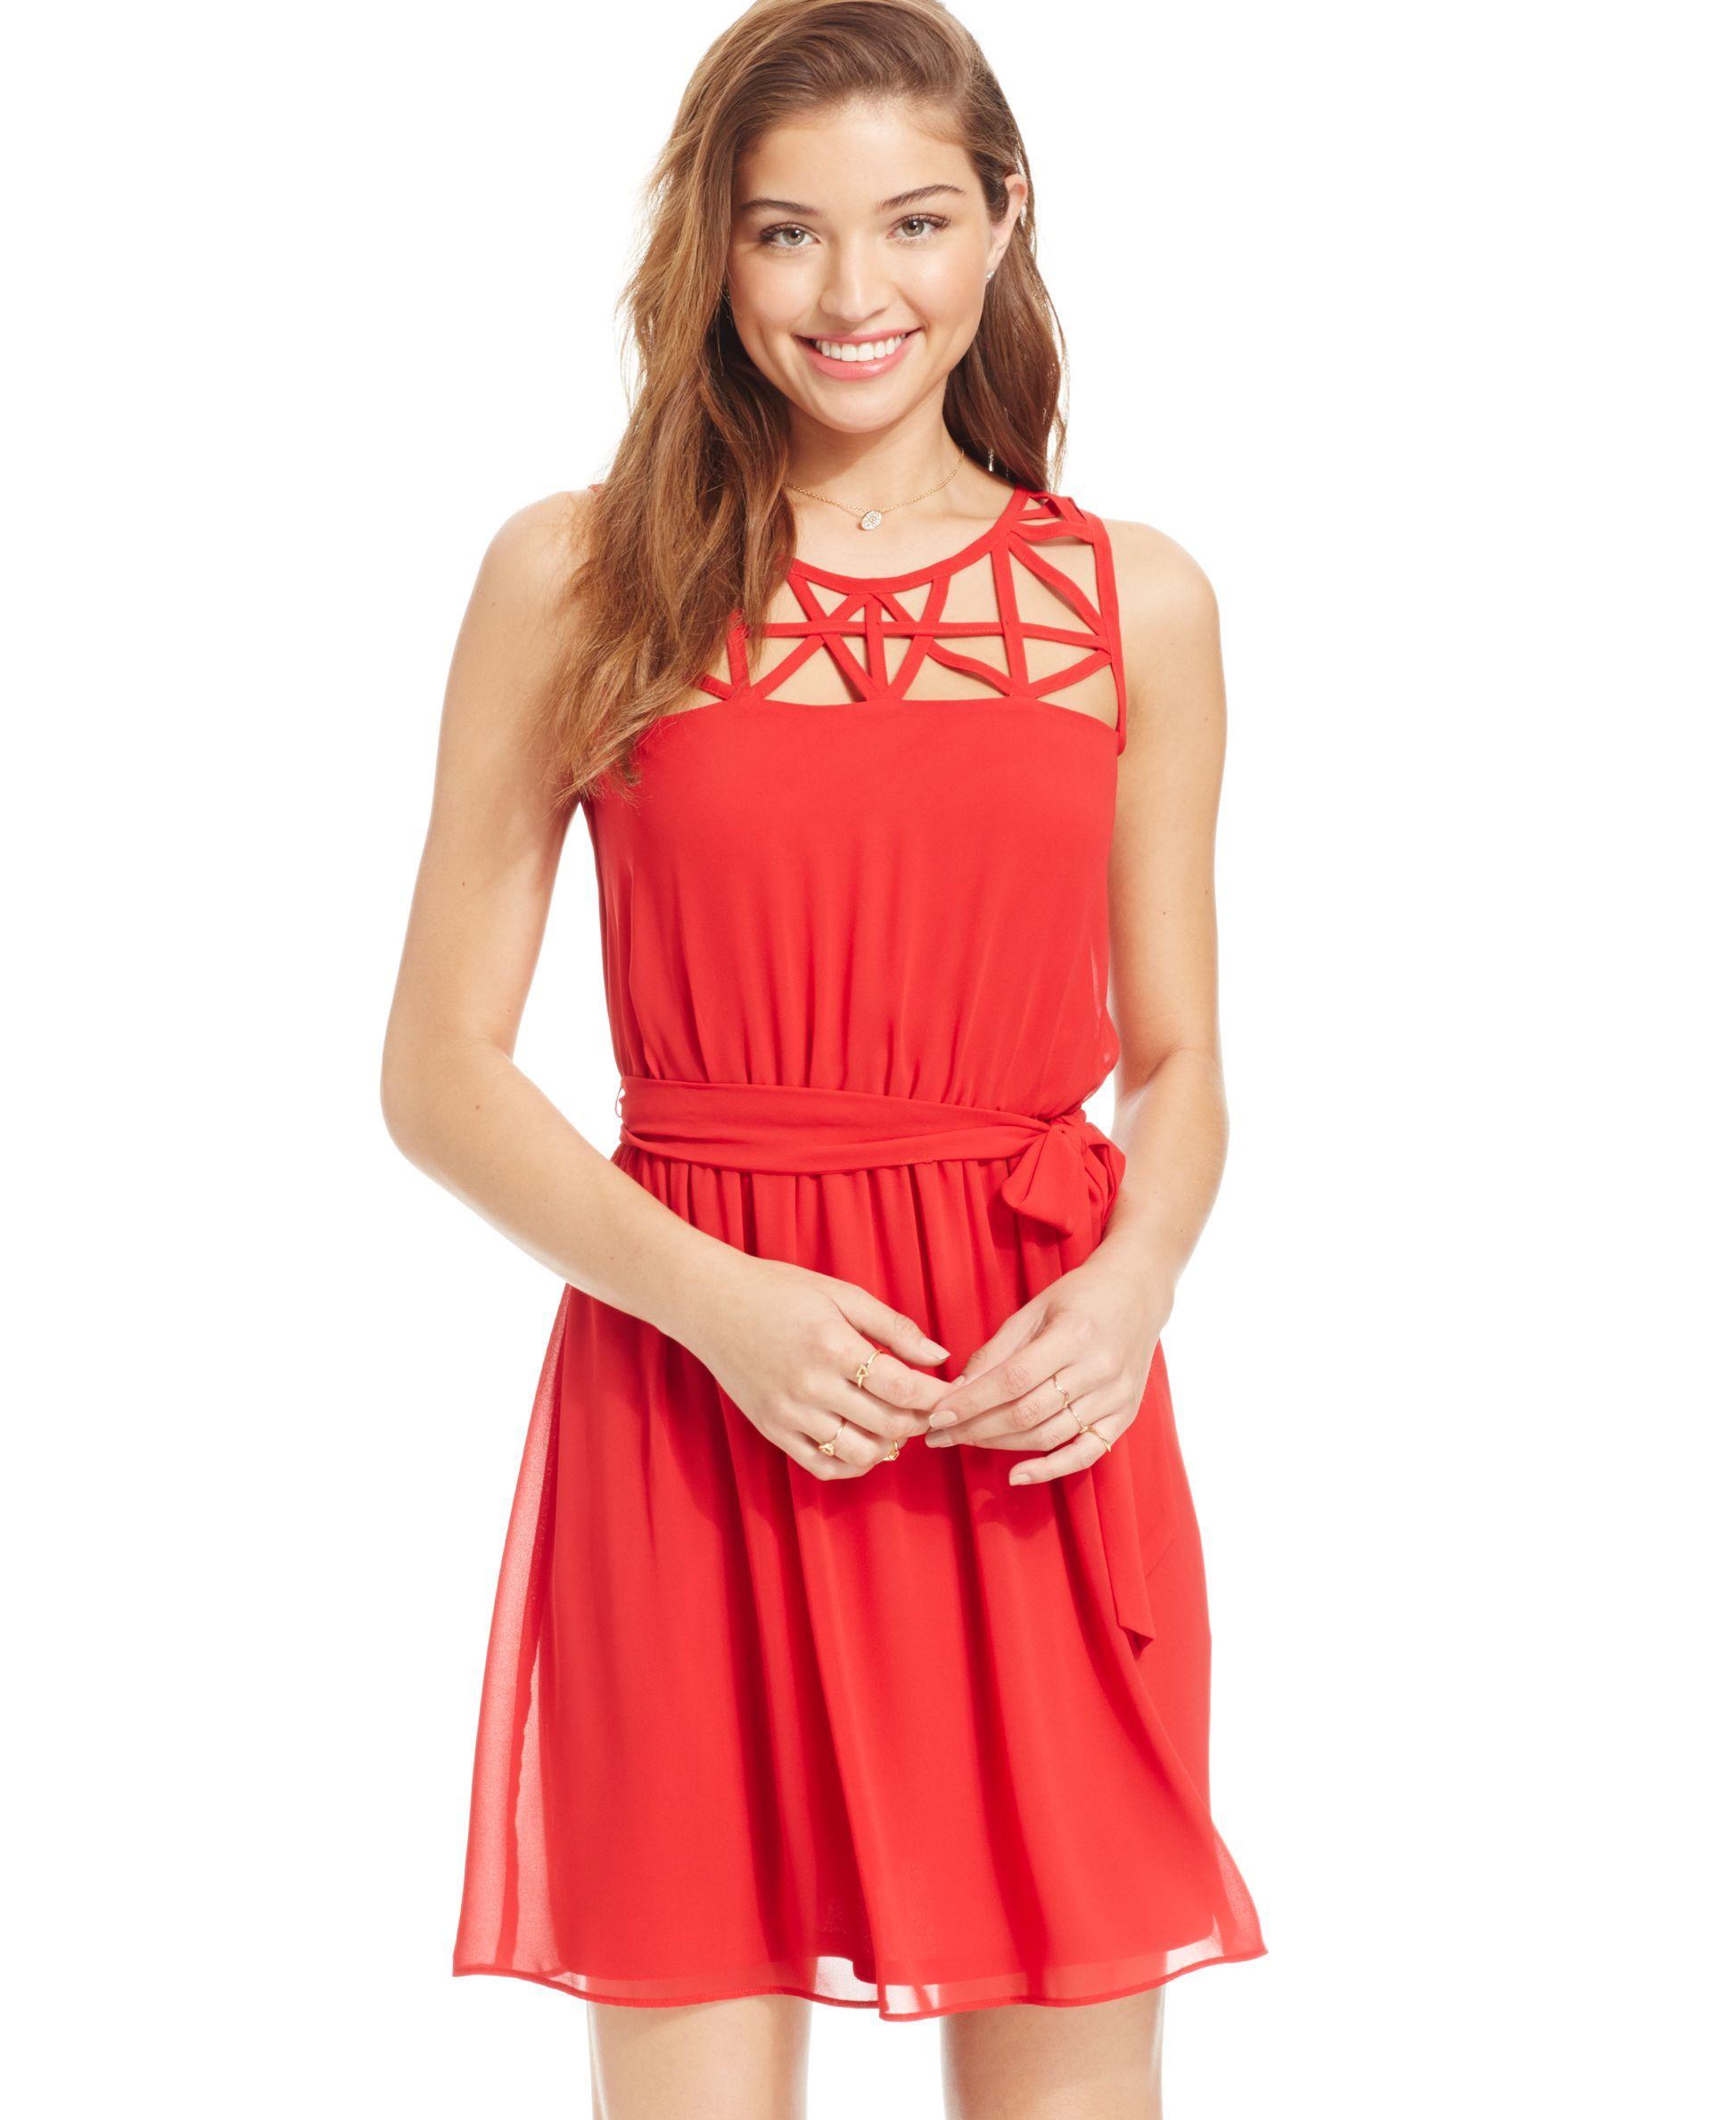 Bcx juniorsu latticefront pleated dress products pinterest